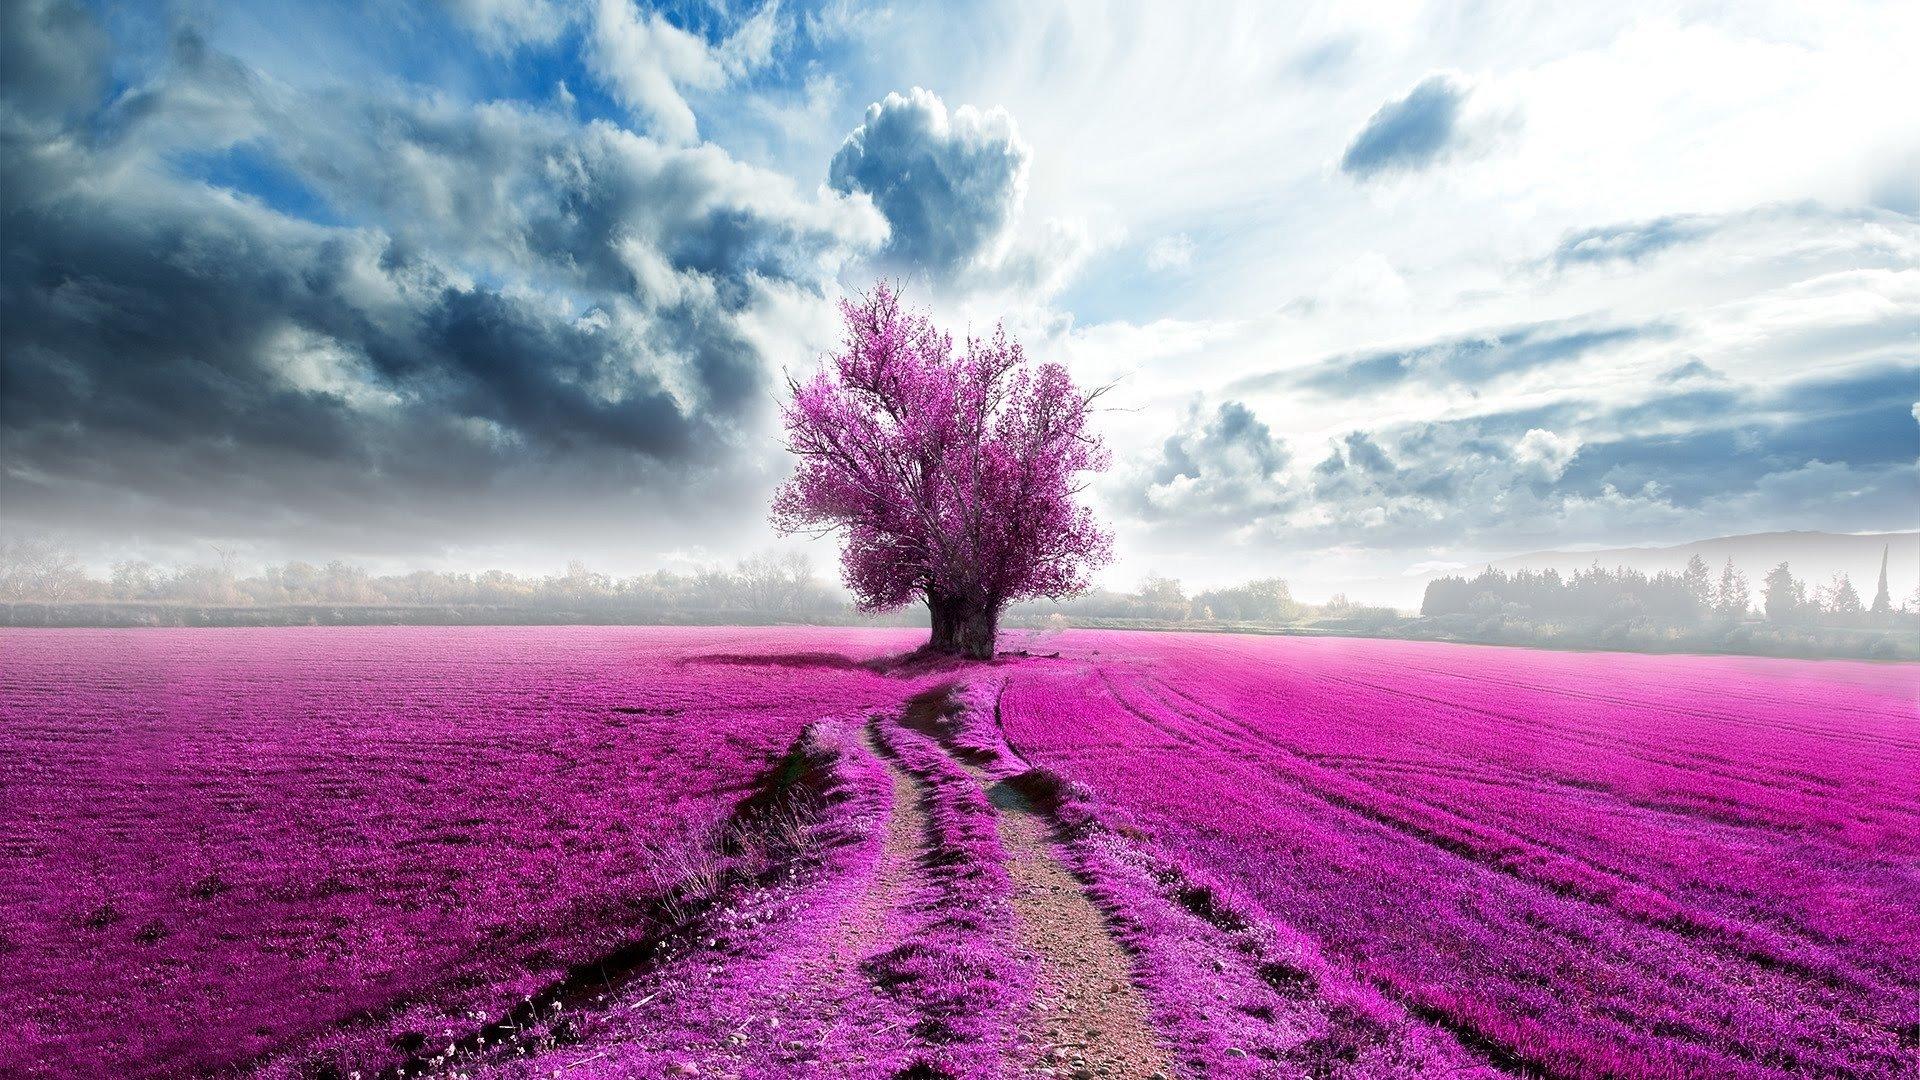 Artistic - Tree  Artistic Field Purple Cloud Wallpaper